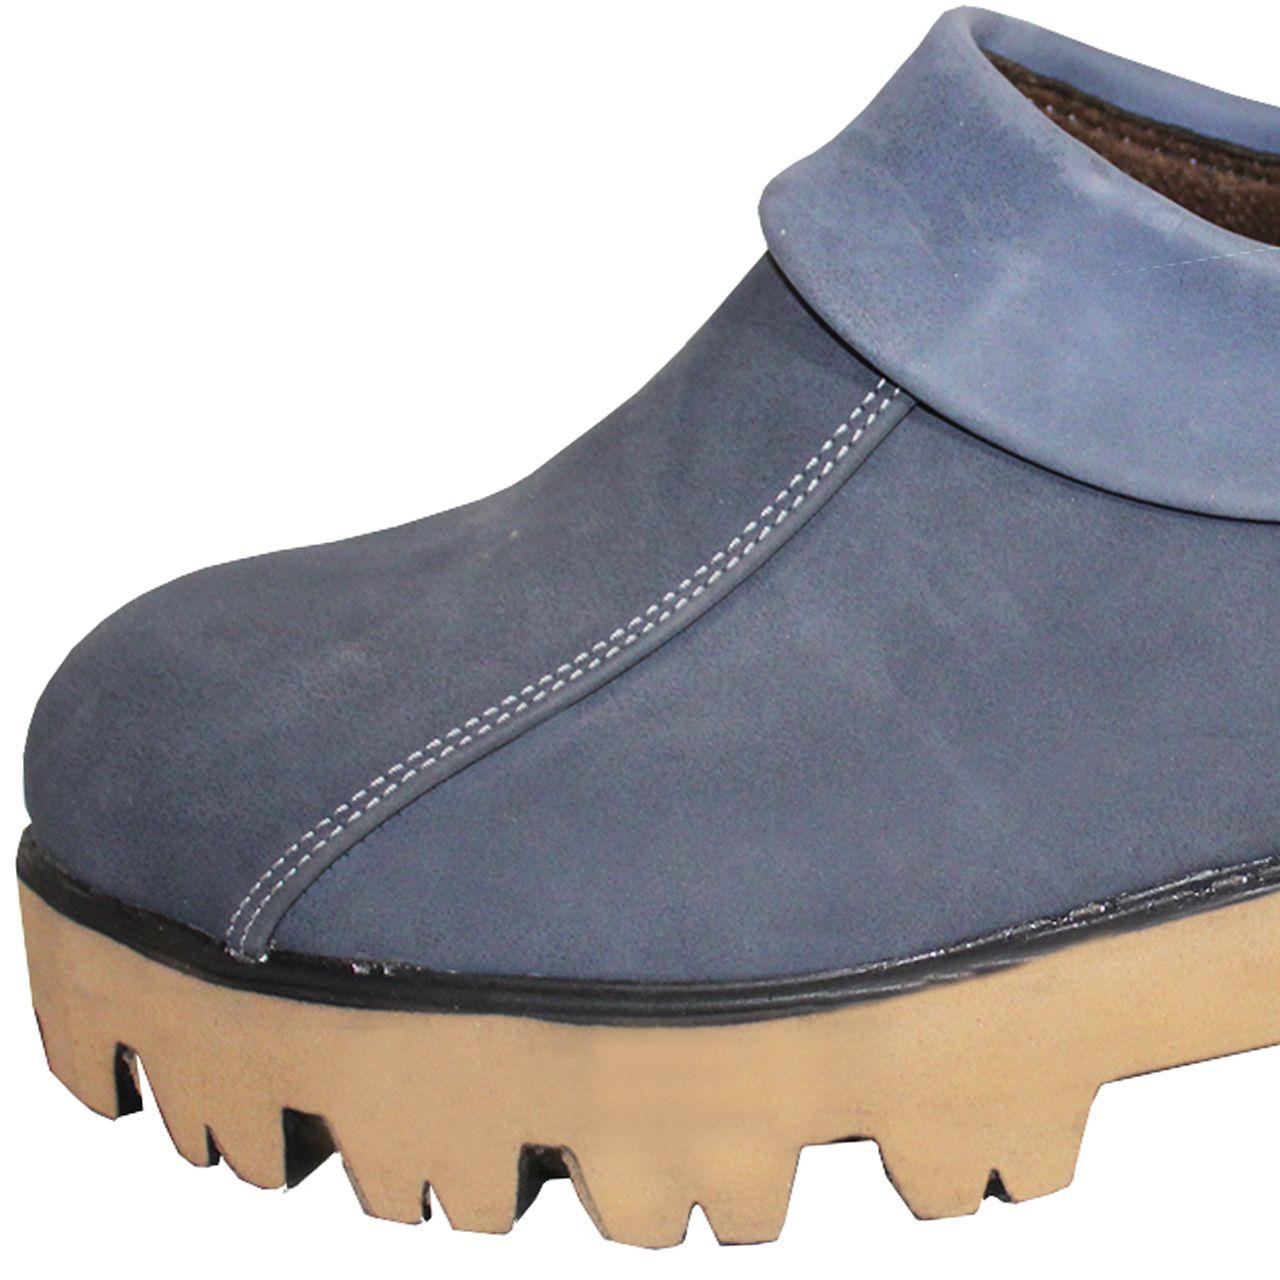 کفش روزمره زنانه کد 6460-A -  - 1